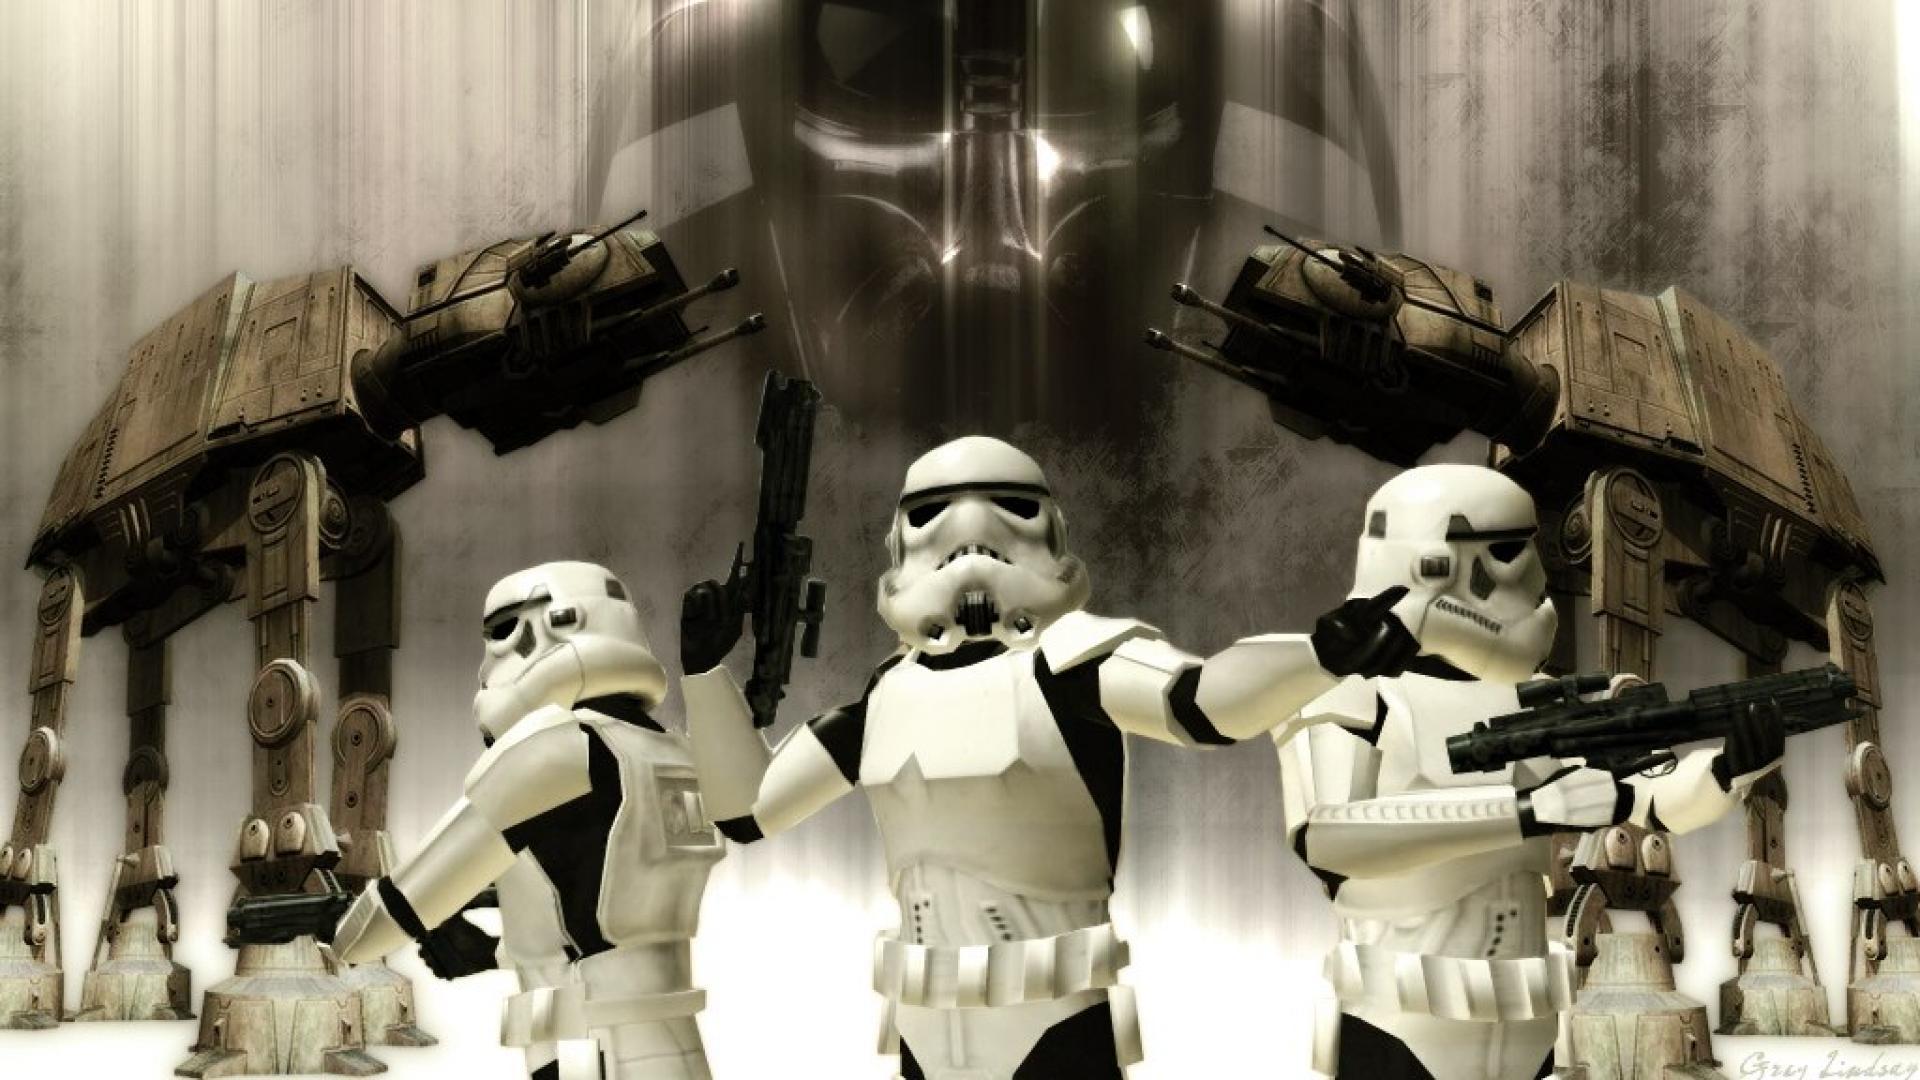 empire stormtroopers star wars hd wallpaper wallpaper 23038 Car 1920x1080